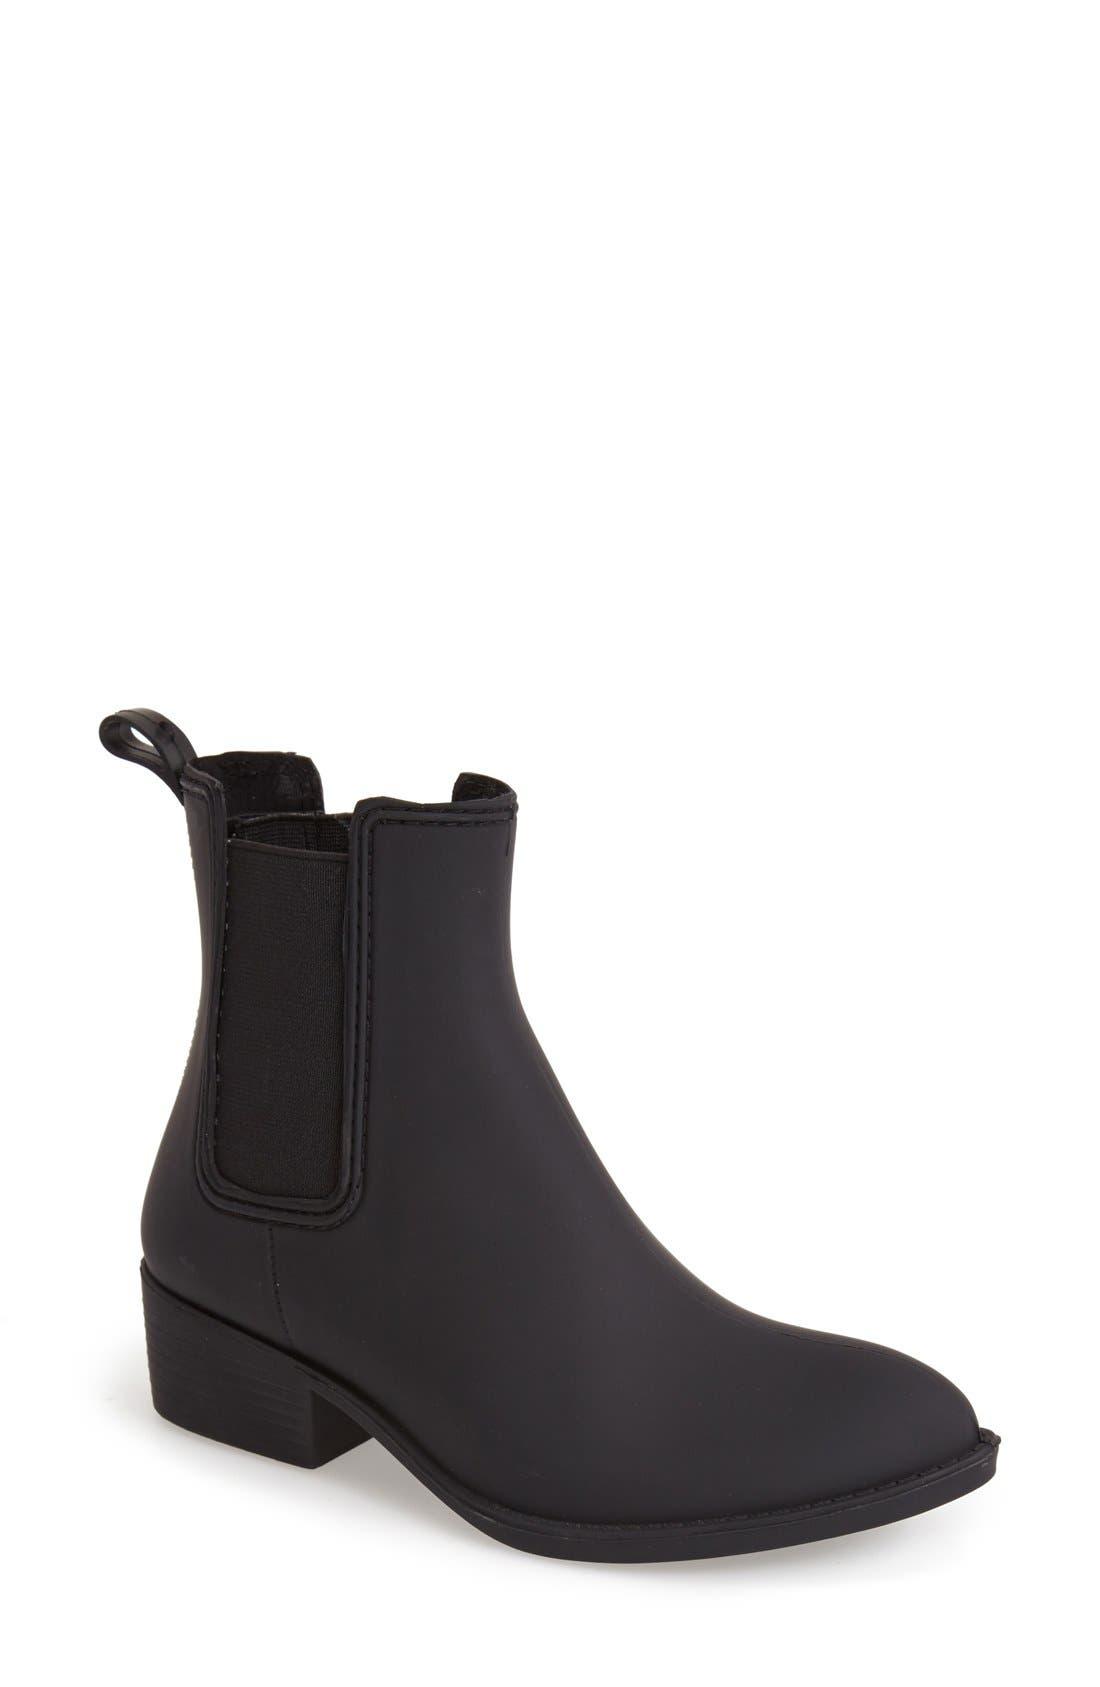 Stormy Rain Boot, Main, color, 077